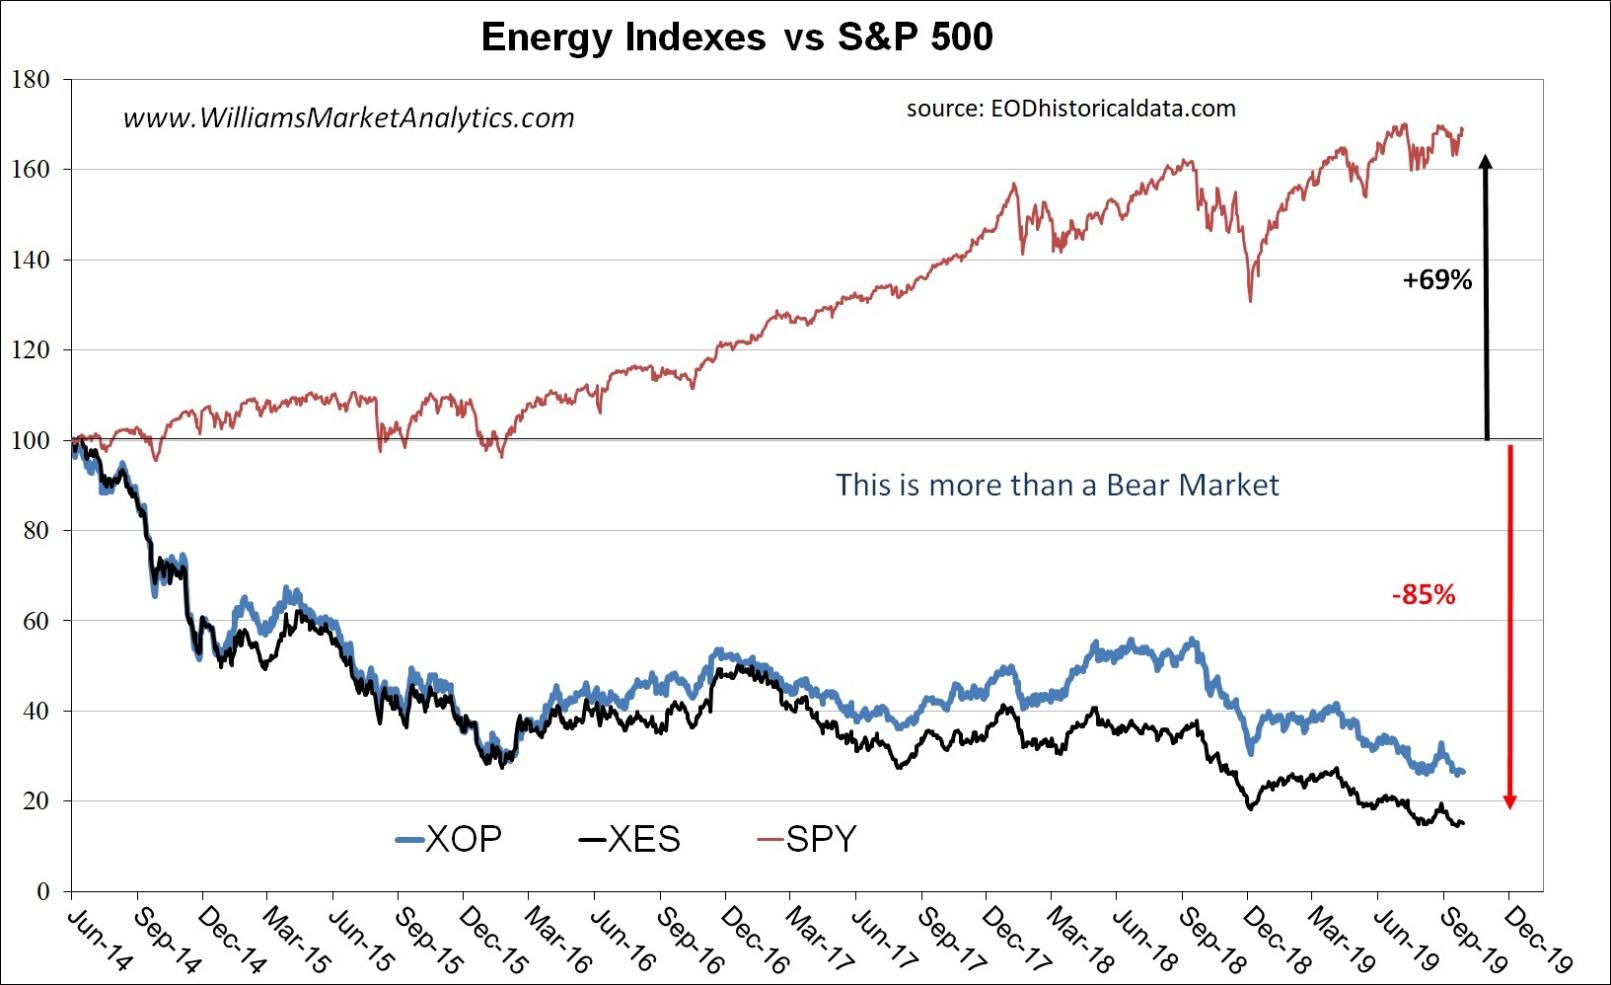 9 Energy Companies That Won't Go Bankrupt